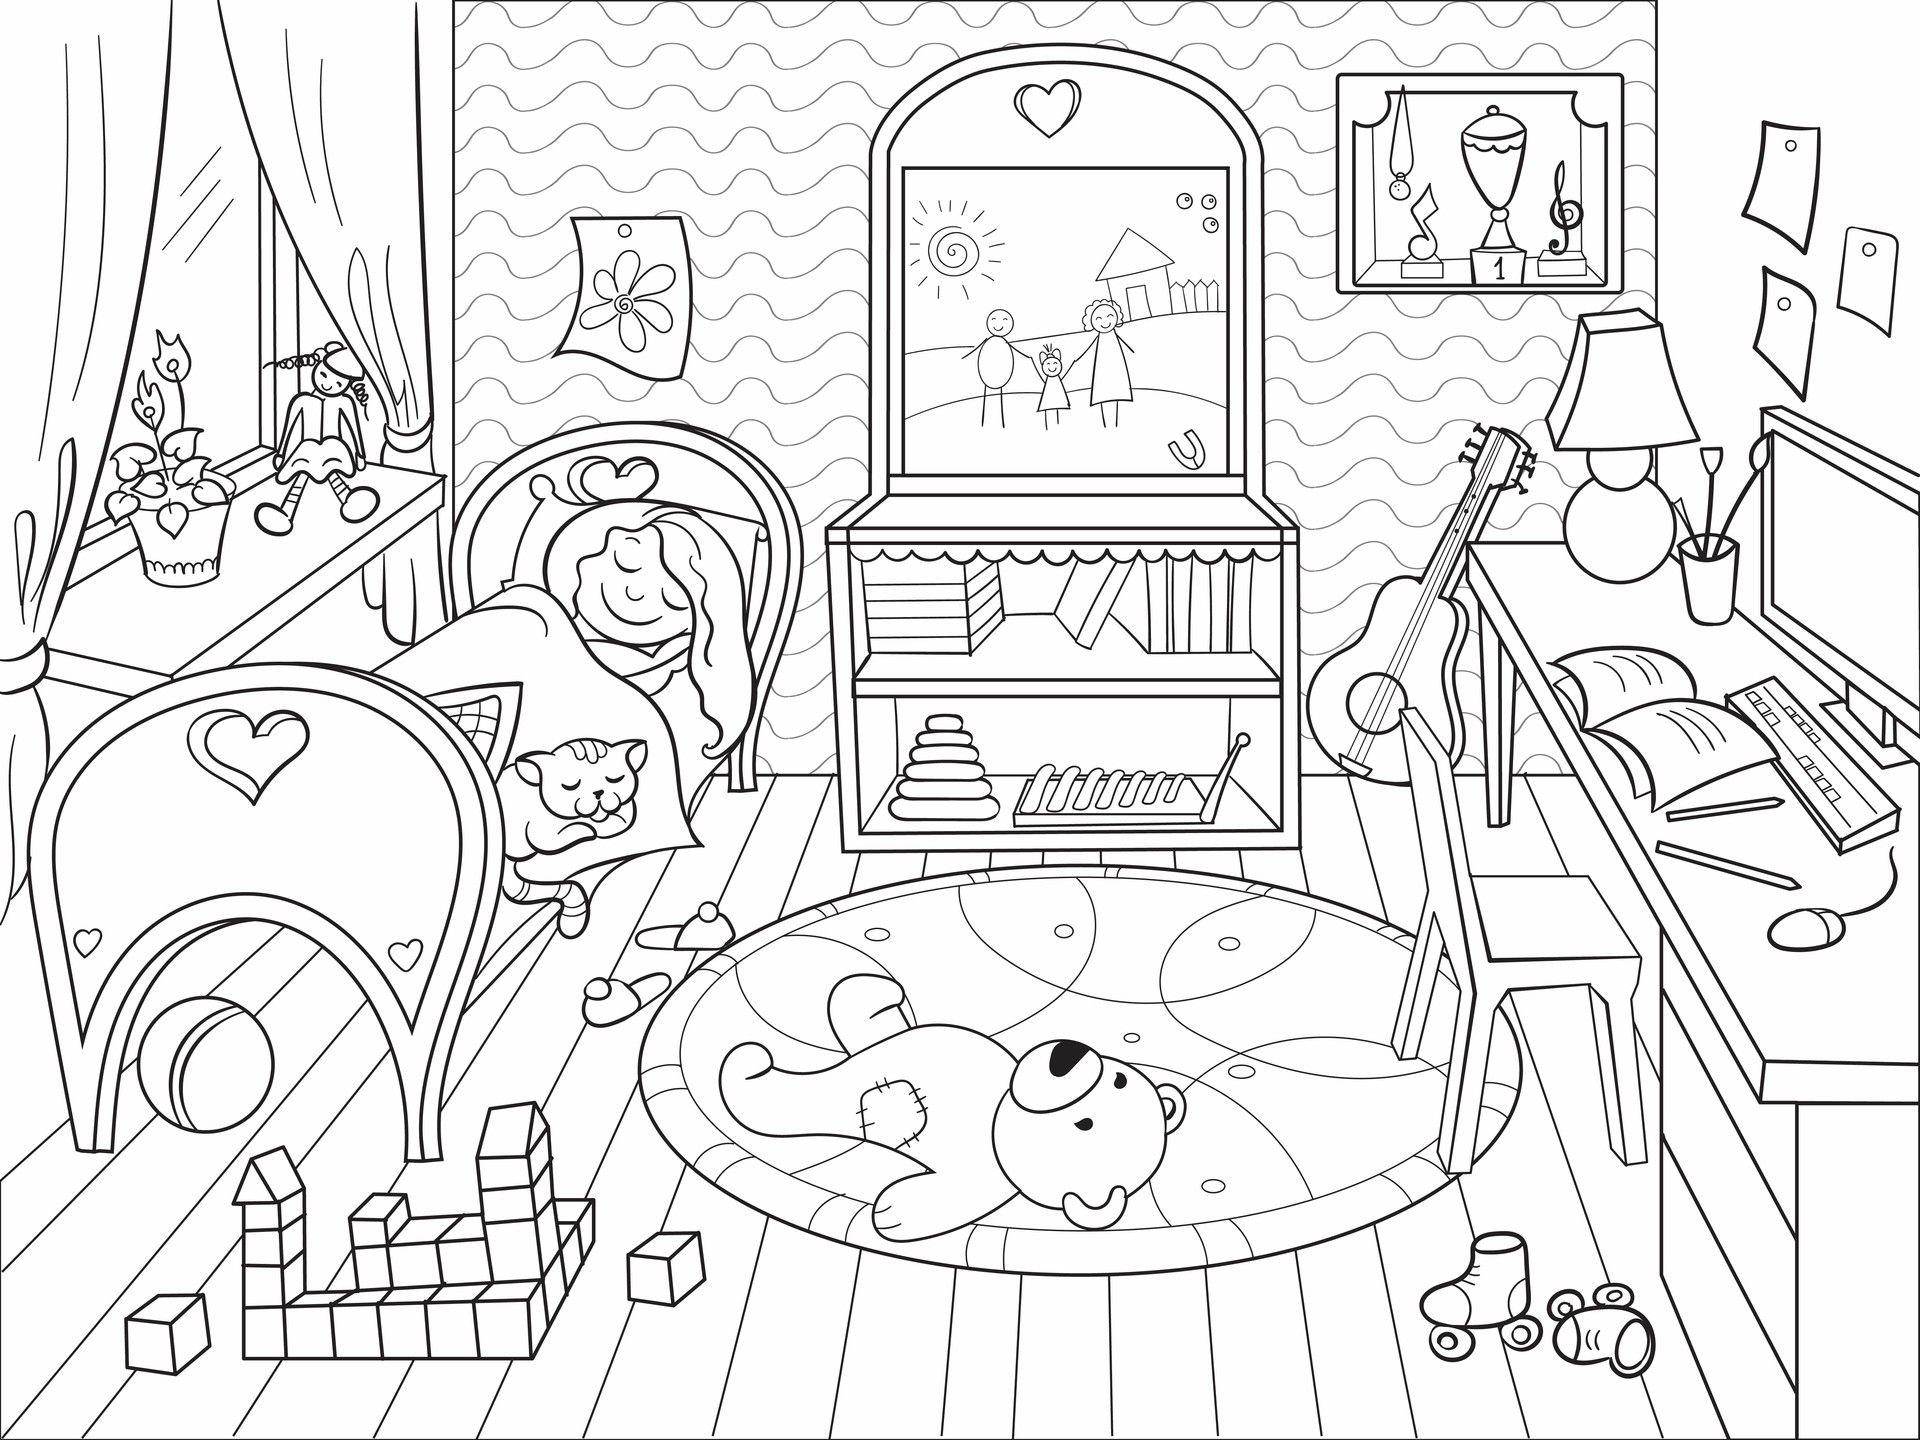 Artstation Coloring Book Julia Novosilska Coloring Books Family Coloring Pages Barbie Coloring Pages